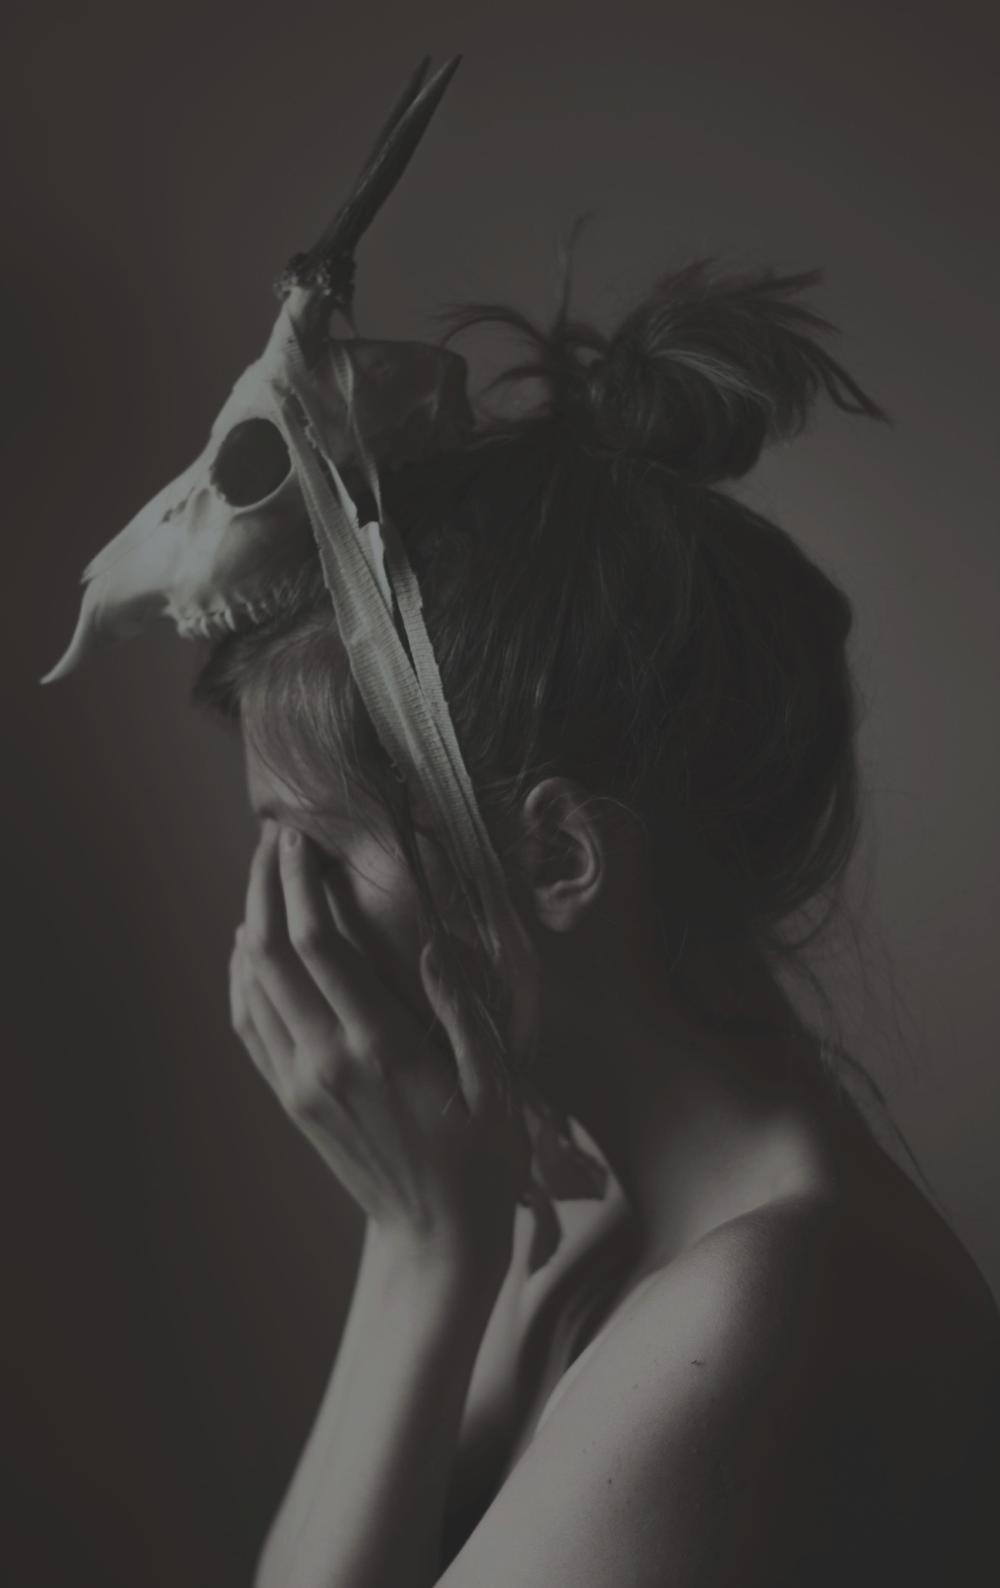 Michalina Wozniak, Inna Forma Niepokoju, photography, dark, obscure, black and white, black & white